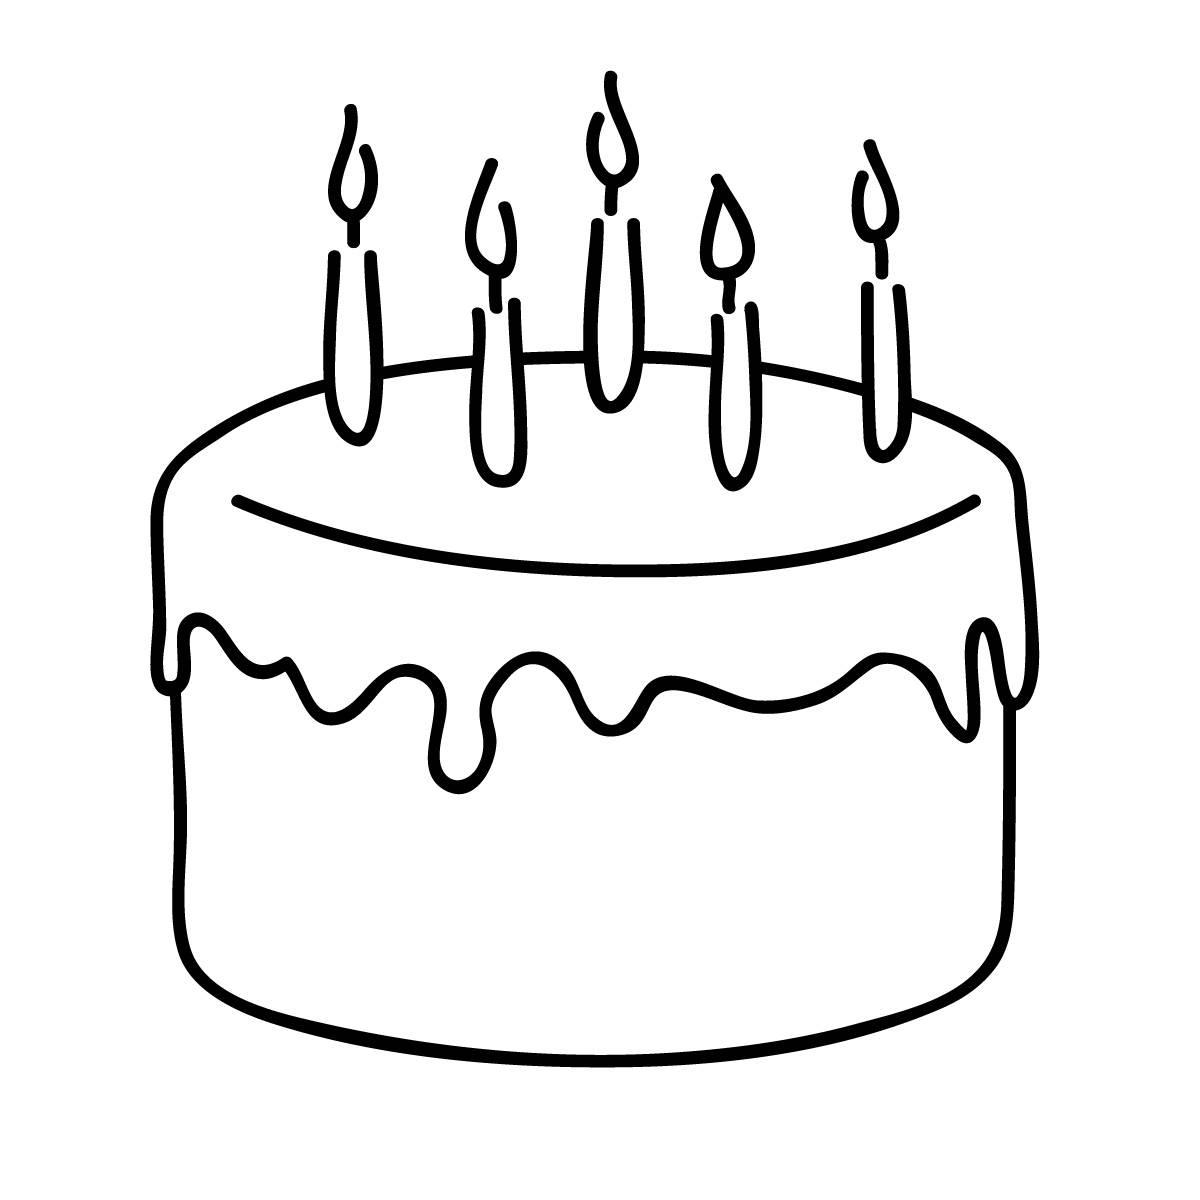 Free Birthday Cake Clip Art Black And White Download Free